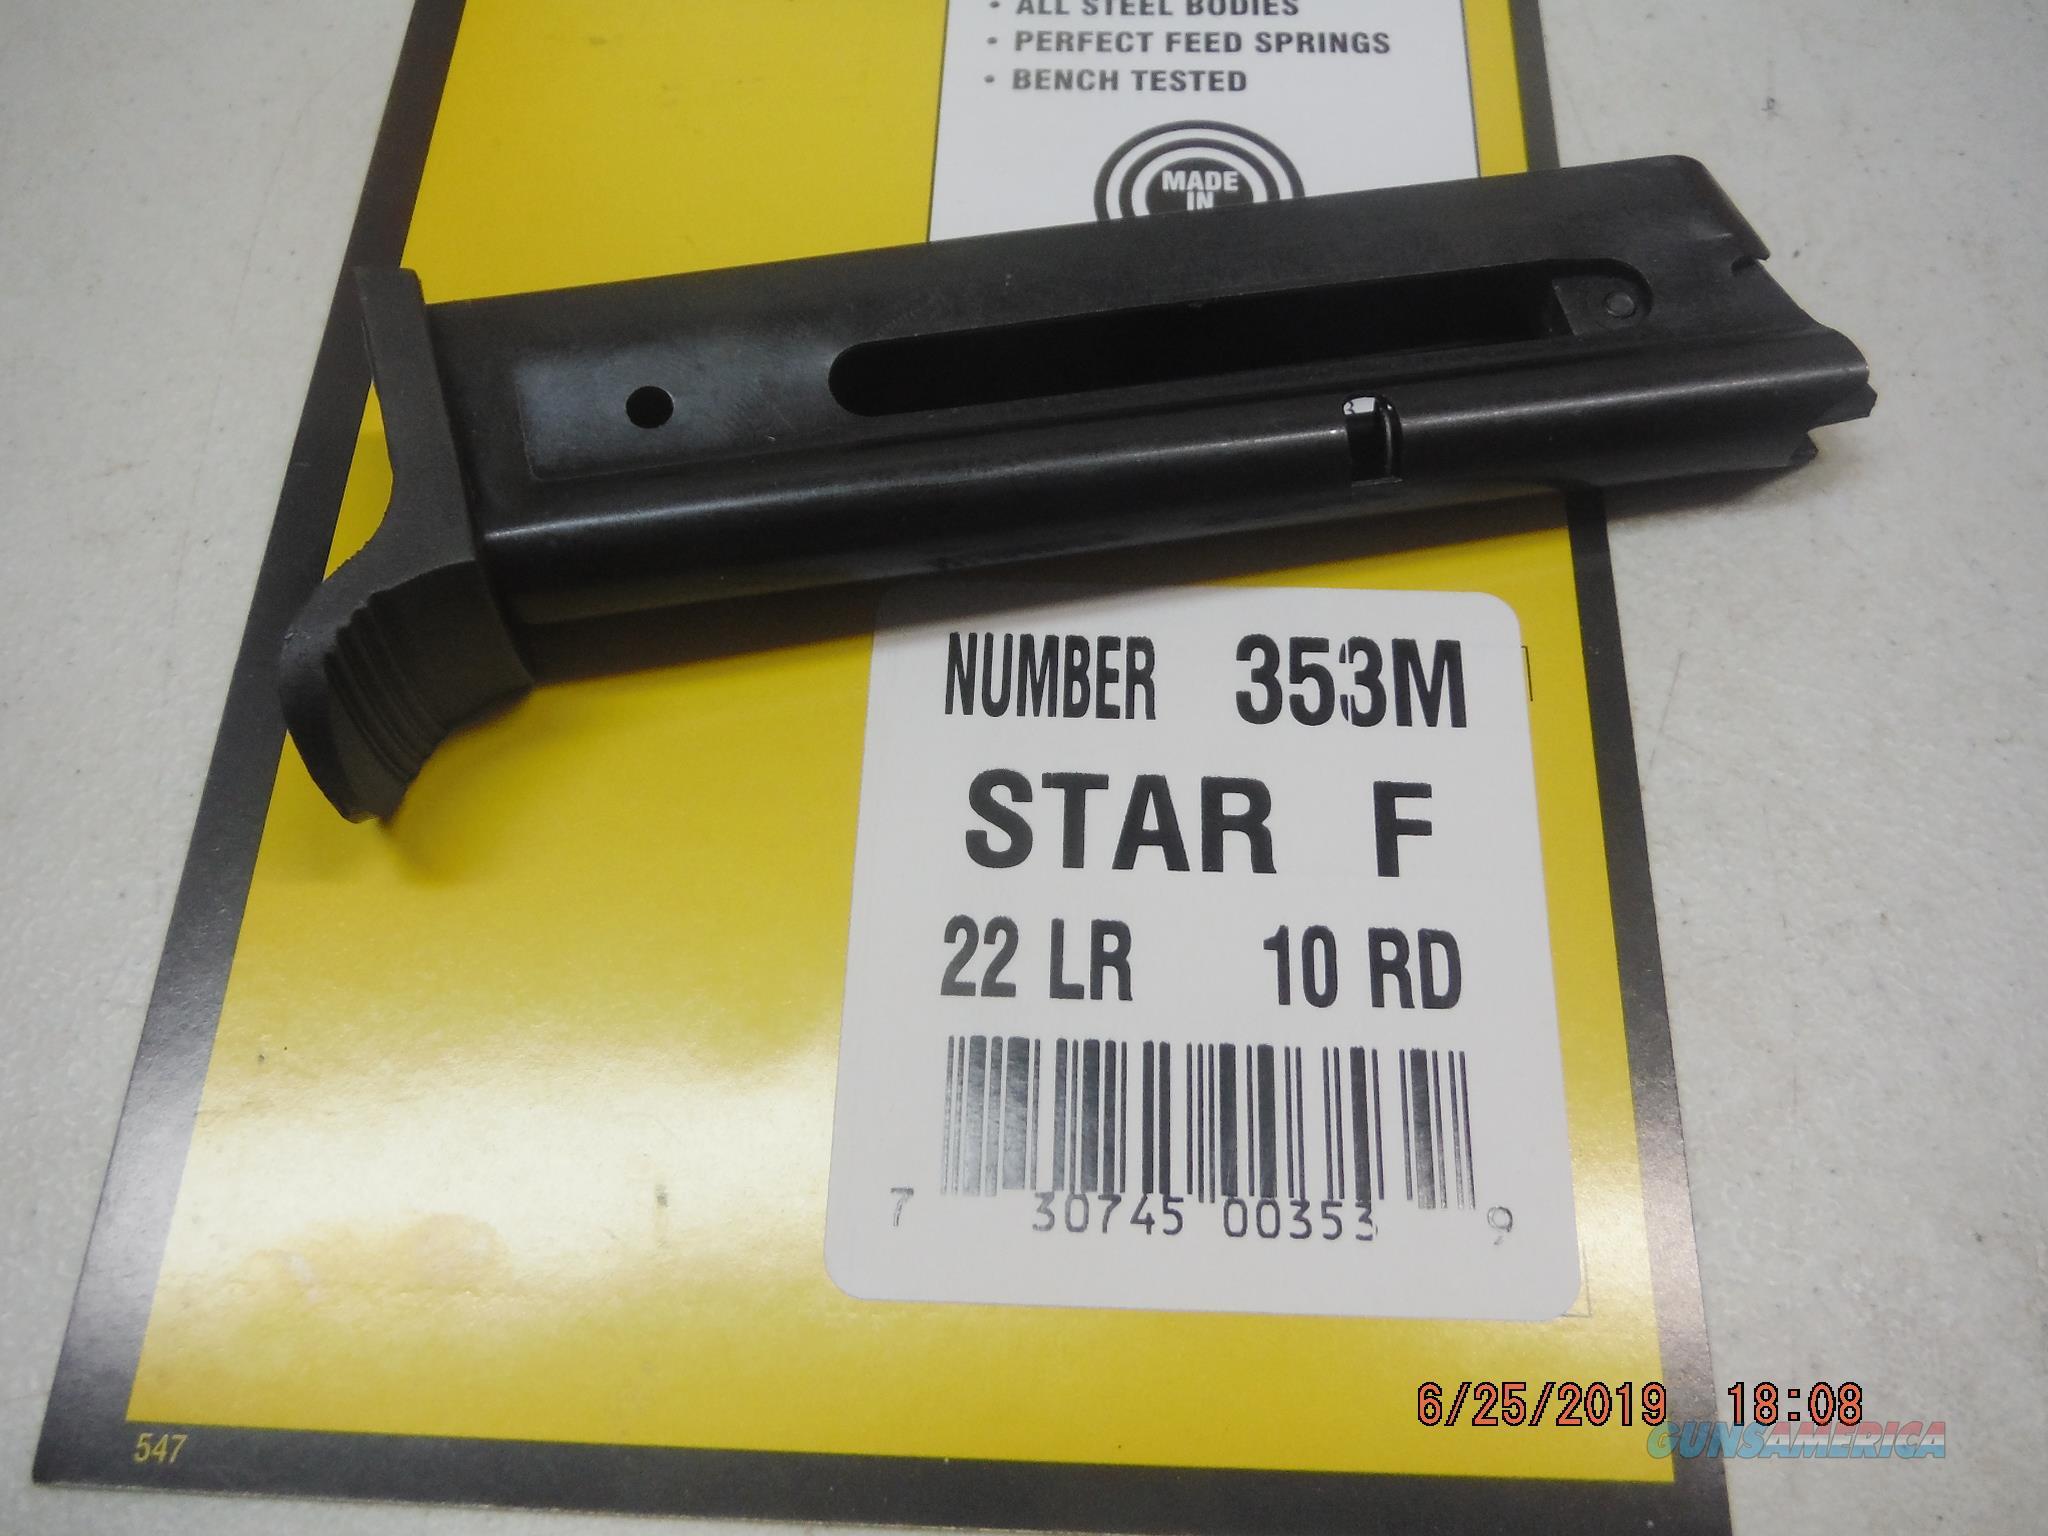 STAR 22 Magazine model F 22LR 10RD MAG  Non-Guns > Magazines & Clips > Pistol Magazines > Other